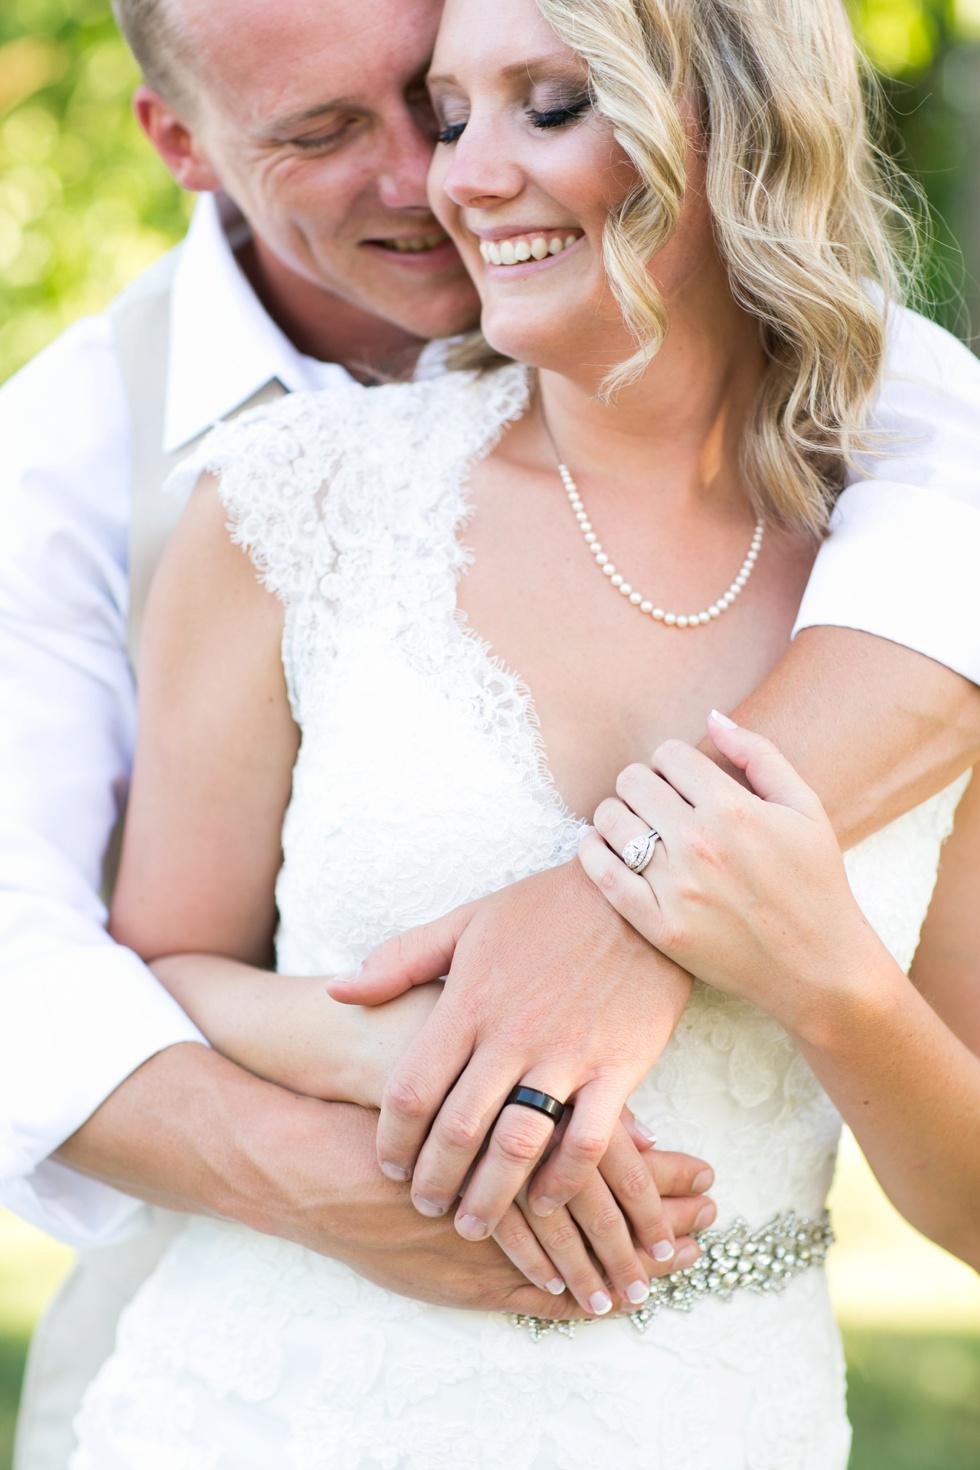 Celebrations at the Bay wedding - Best Wedding photographer of 2015